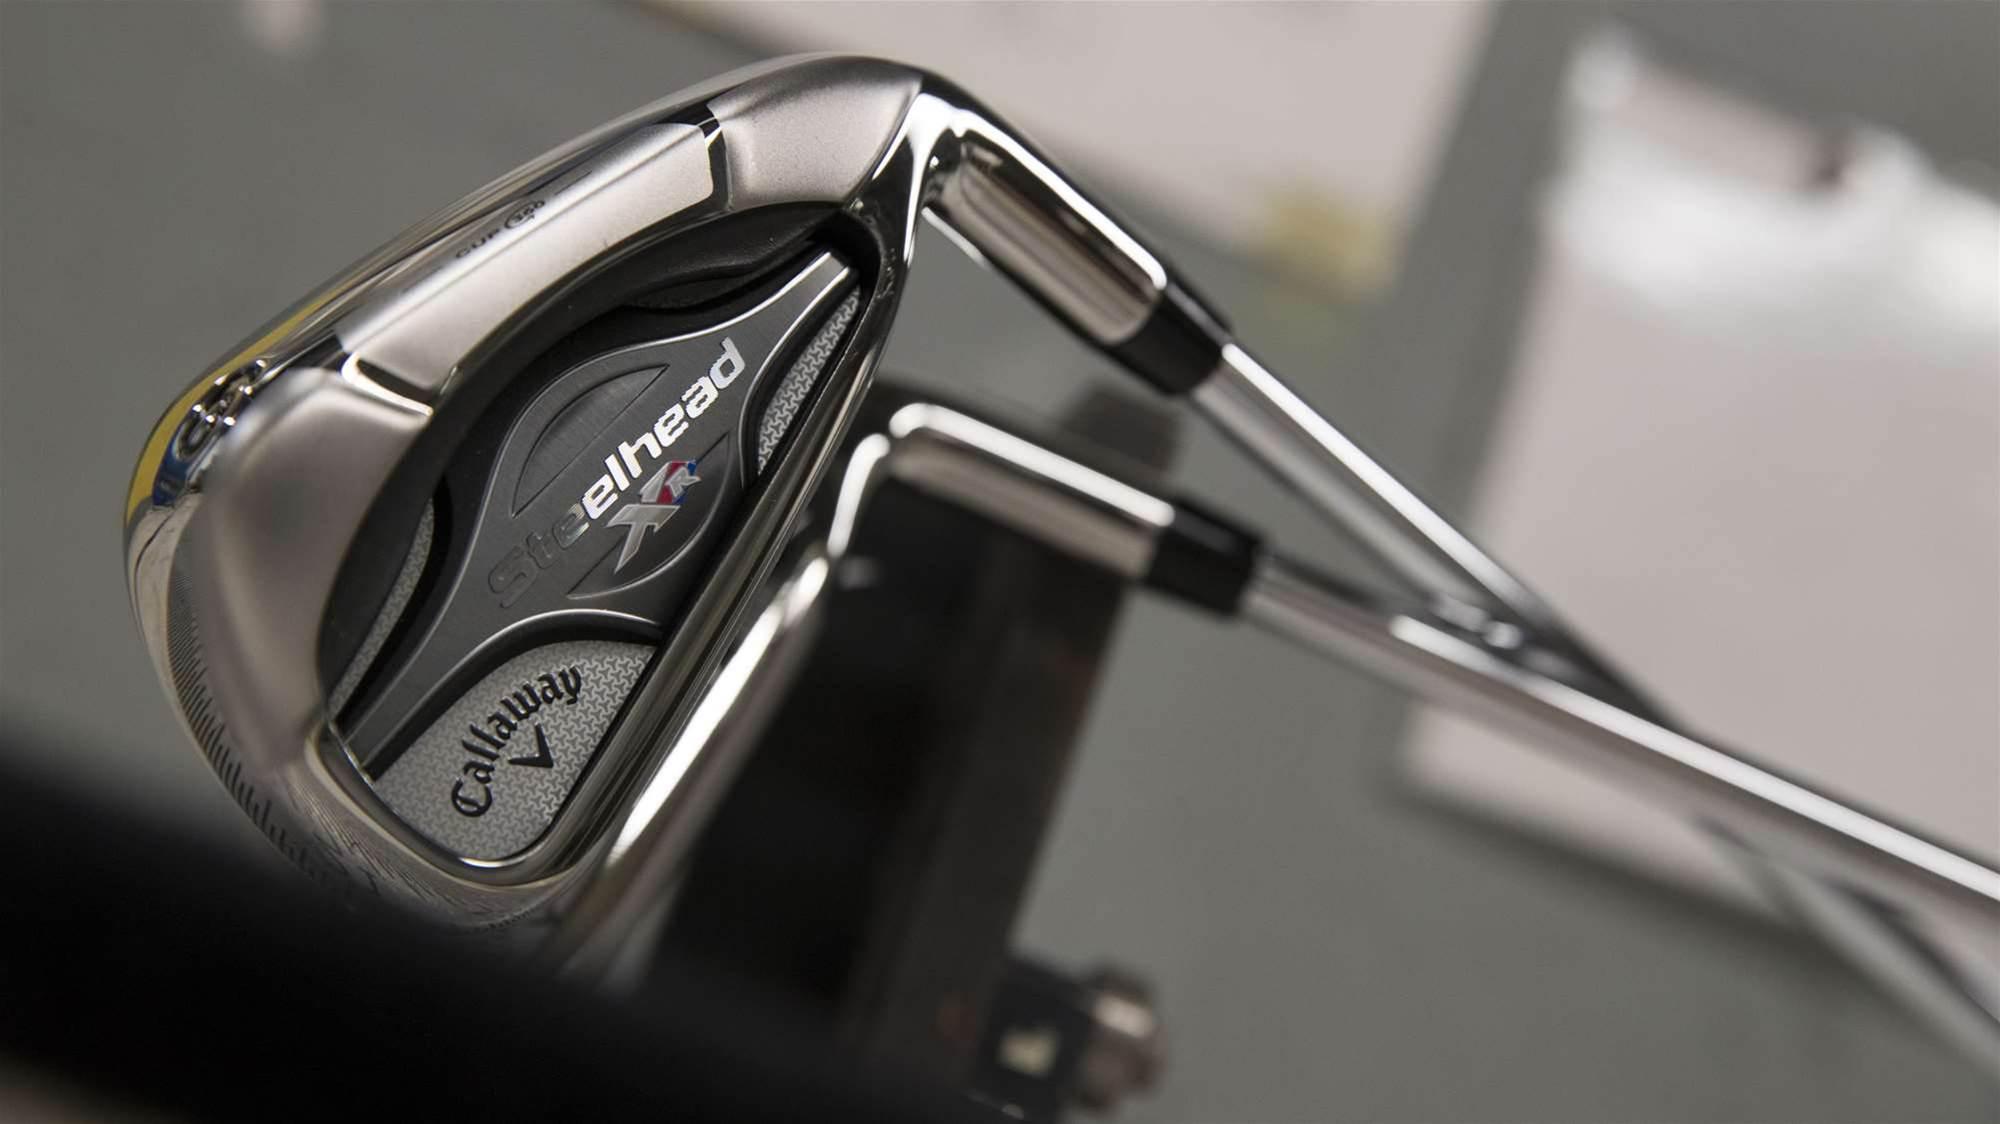 New Gear: Callaway Steelhead XR irons